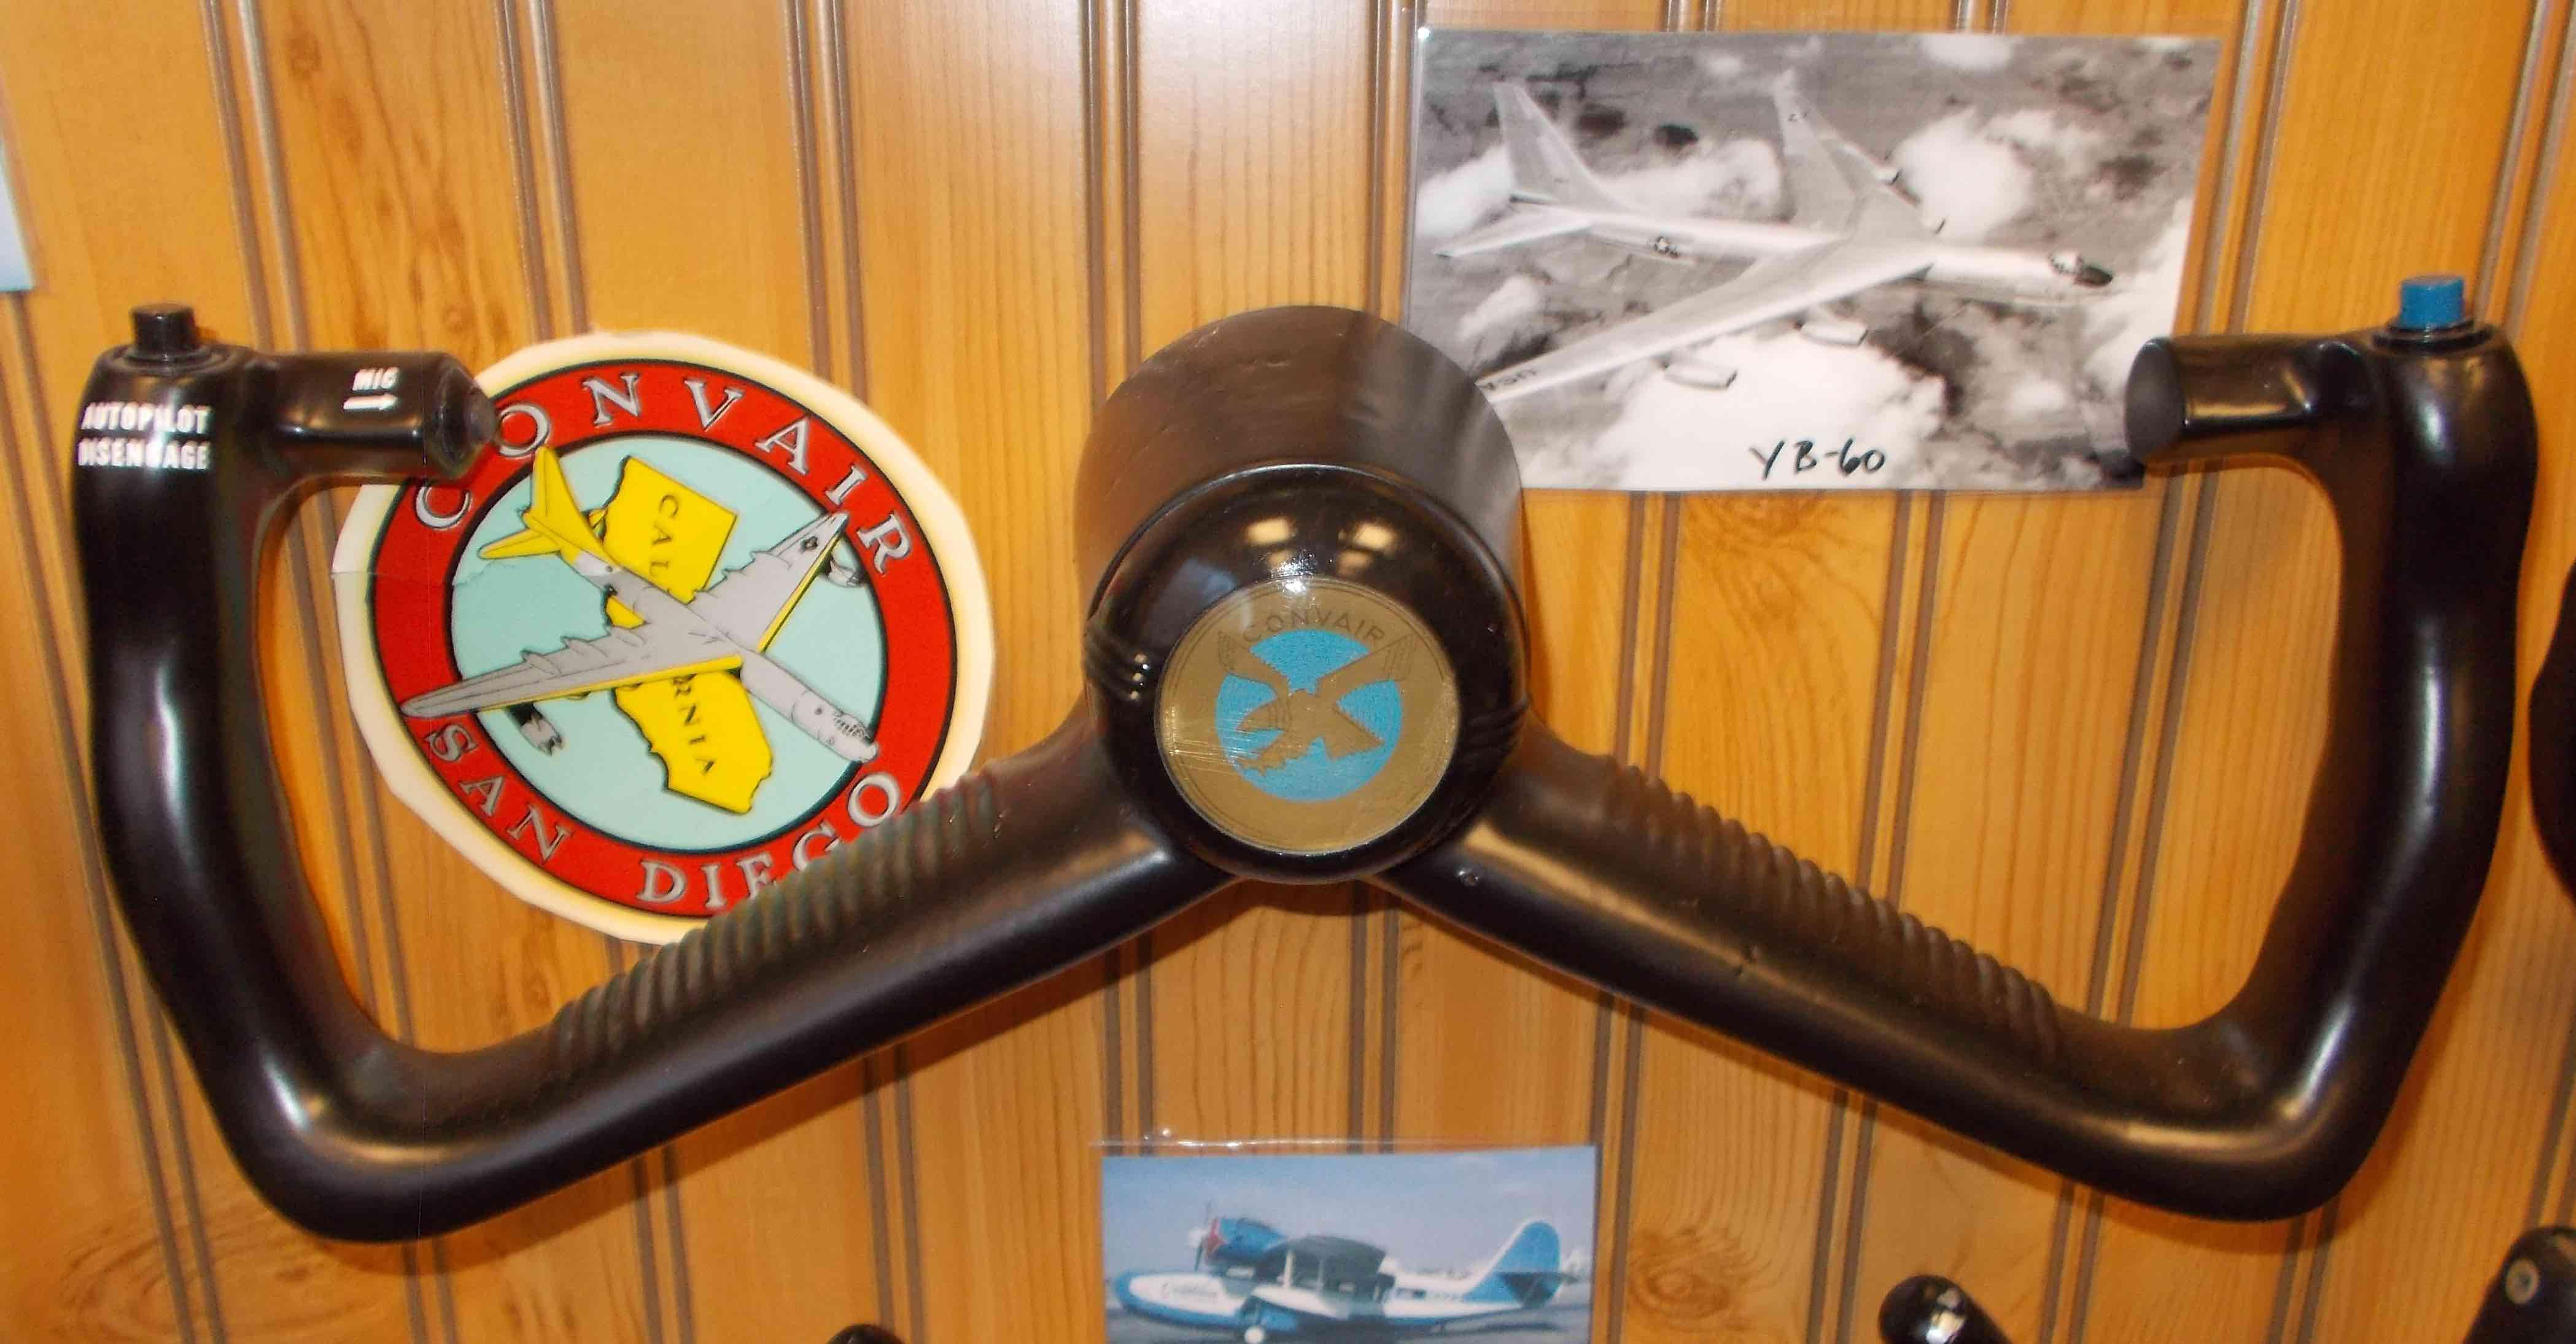 YB-60...B-36 prototype